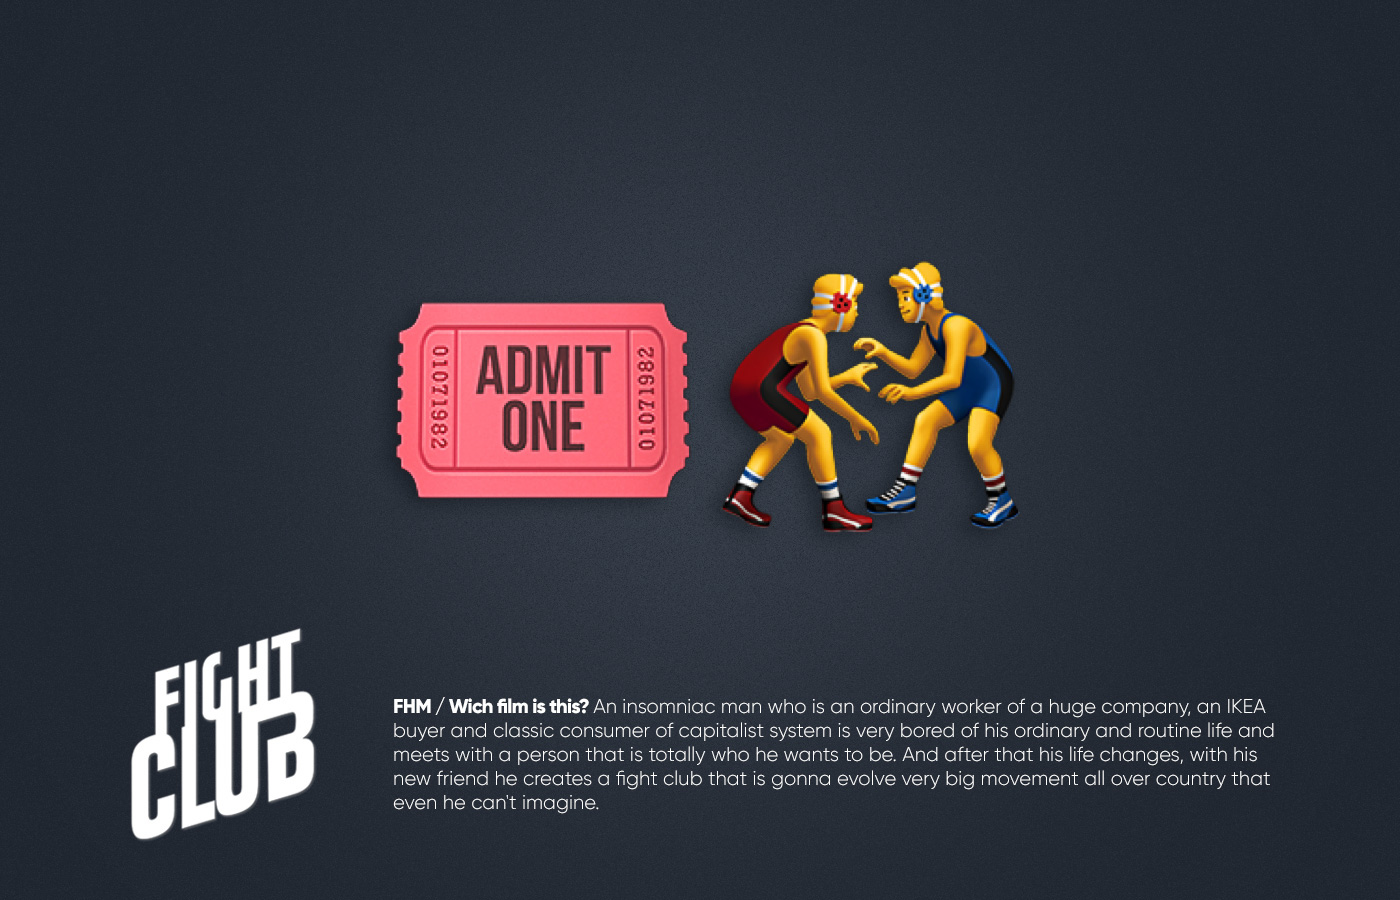 Películas famosas representadas por emojis - Agencia Graf